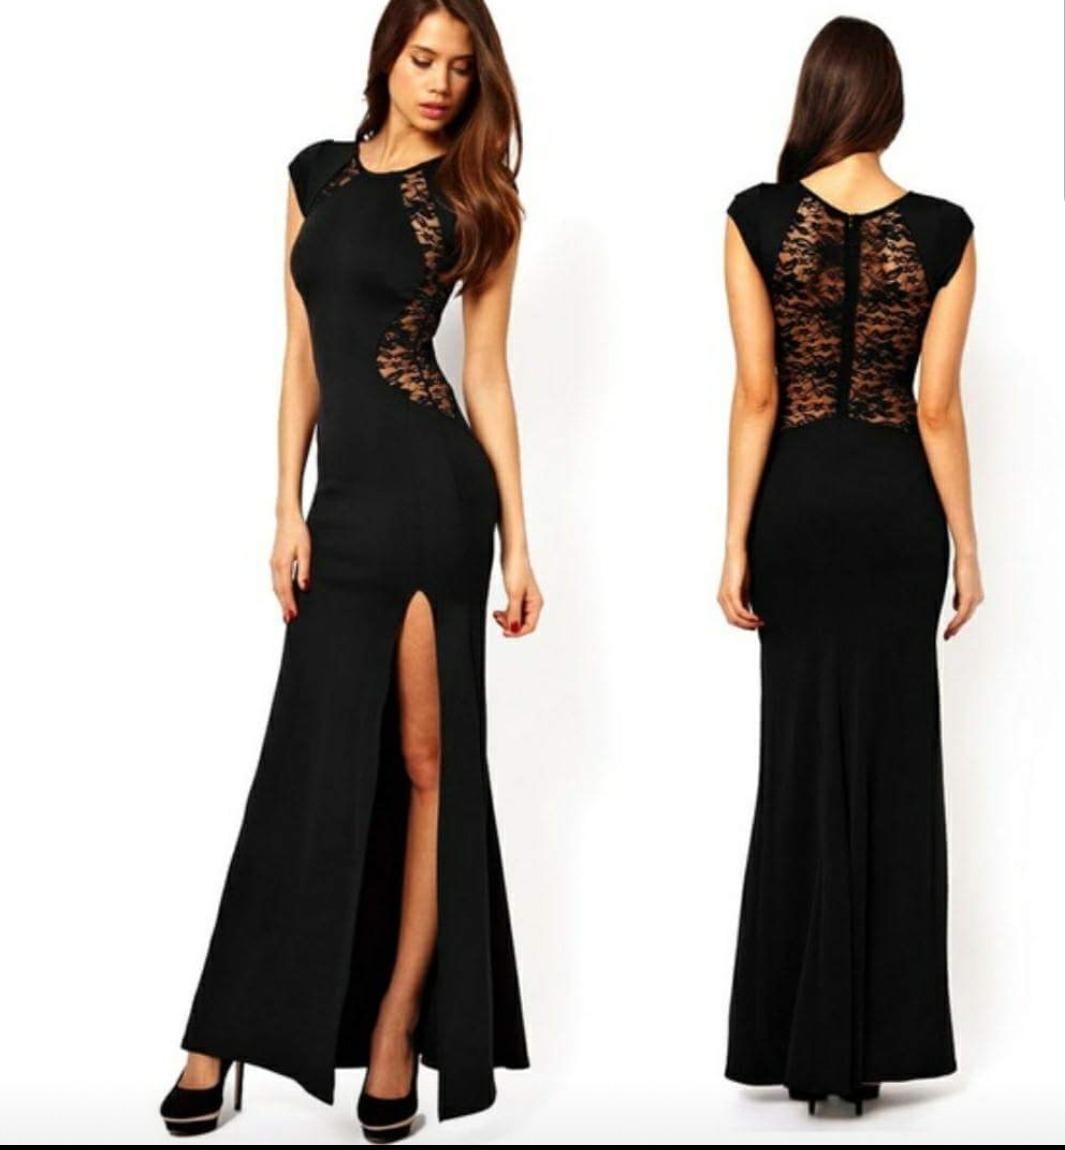 59ebd62a60 Vestido De Gala Color Negro -   28.990 en Mercado Libre